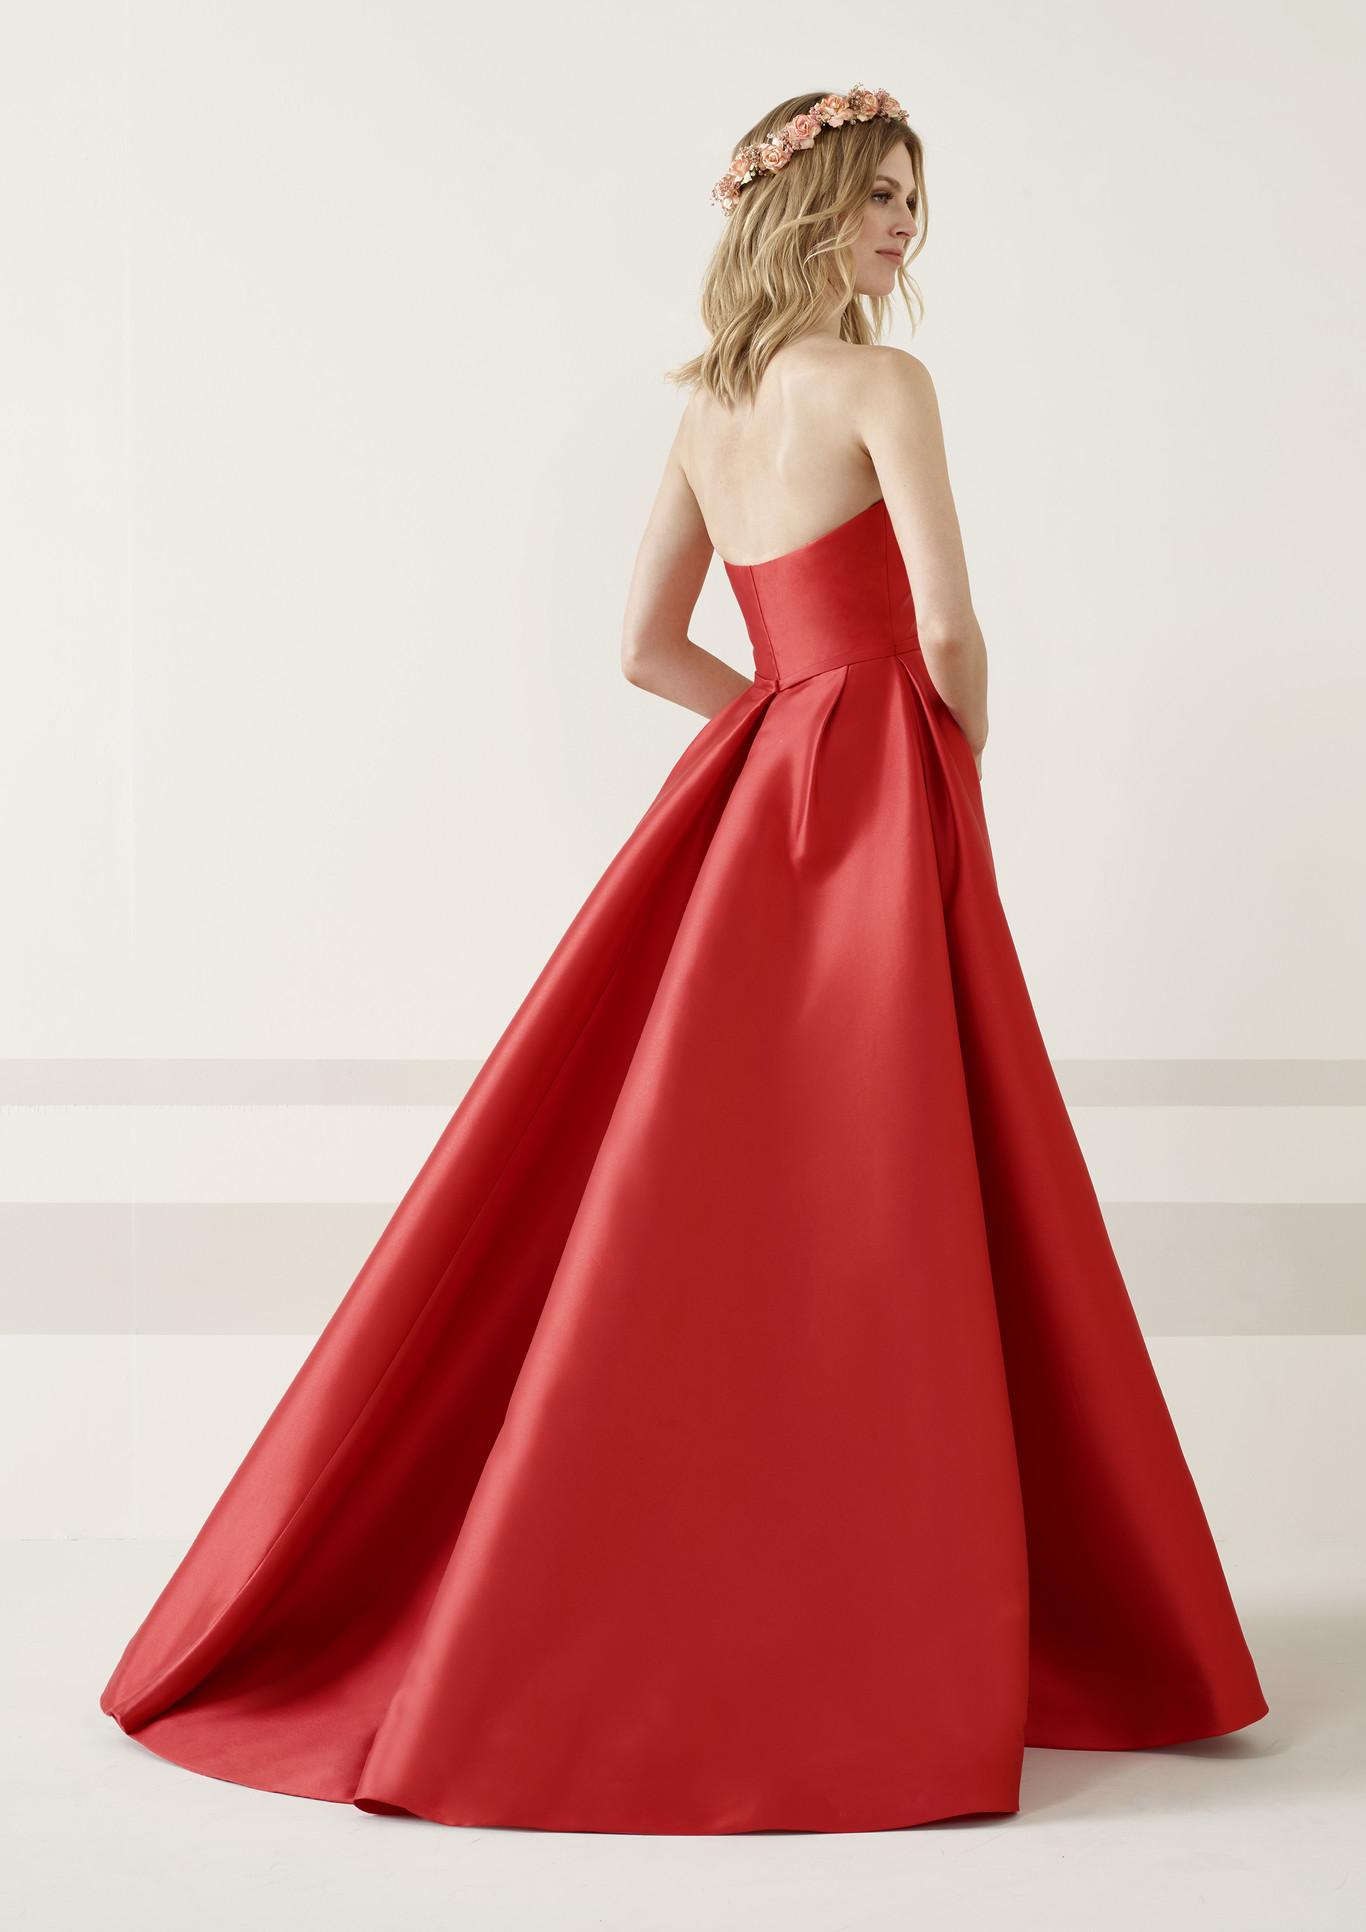 Vestidos de fiesta largos alfombra roja